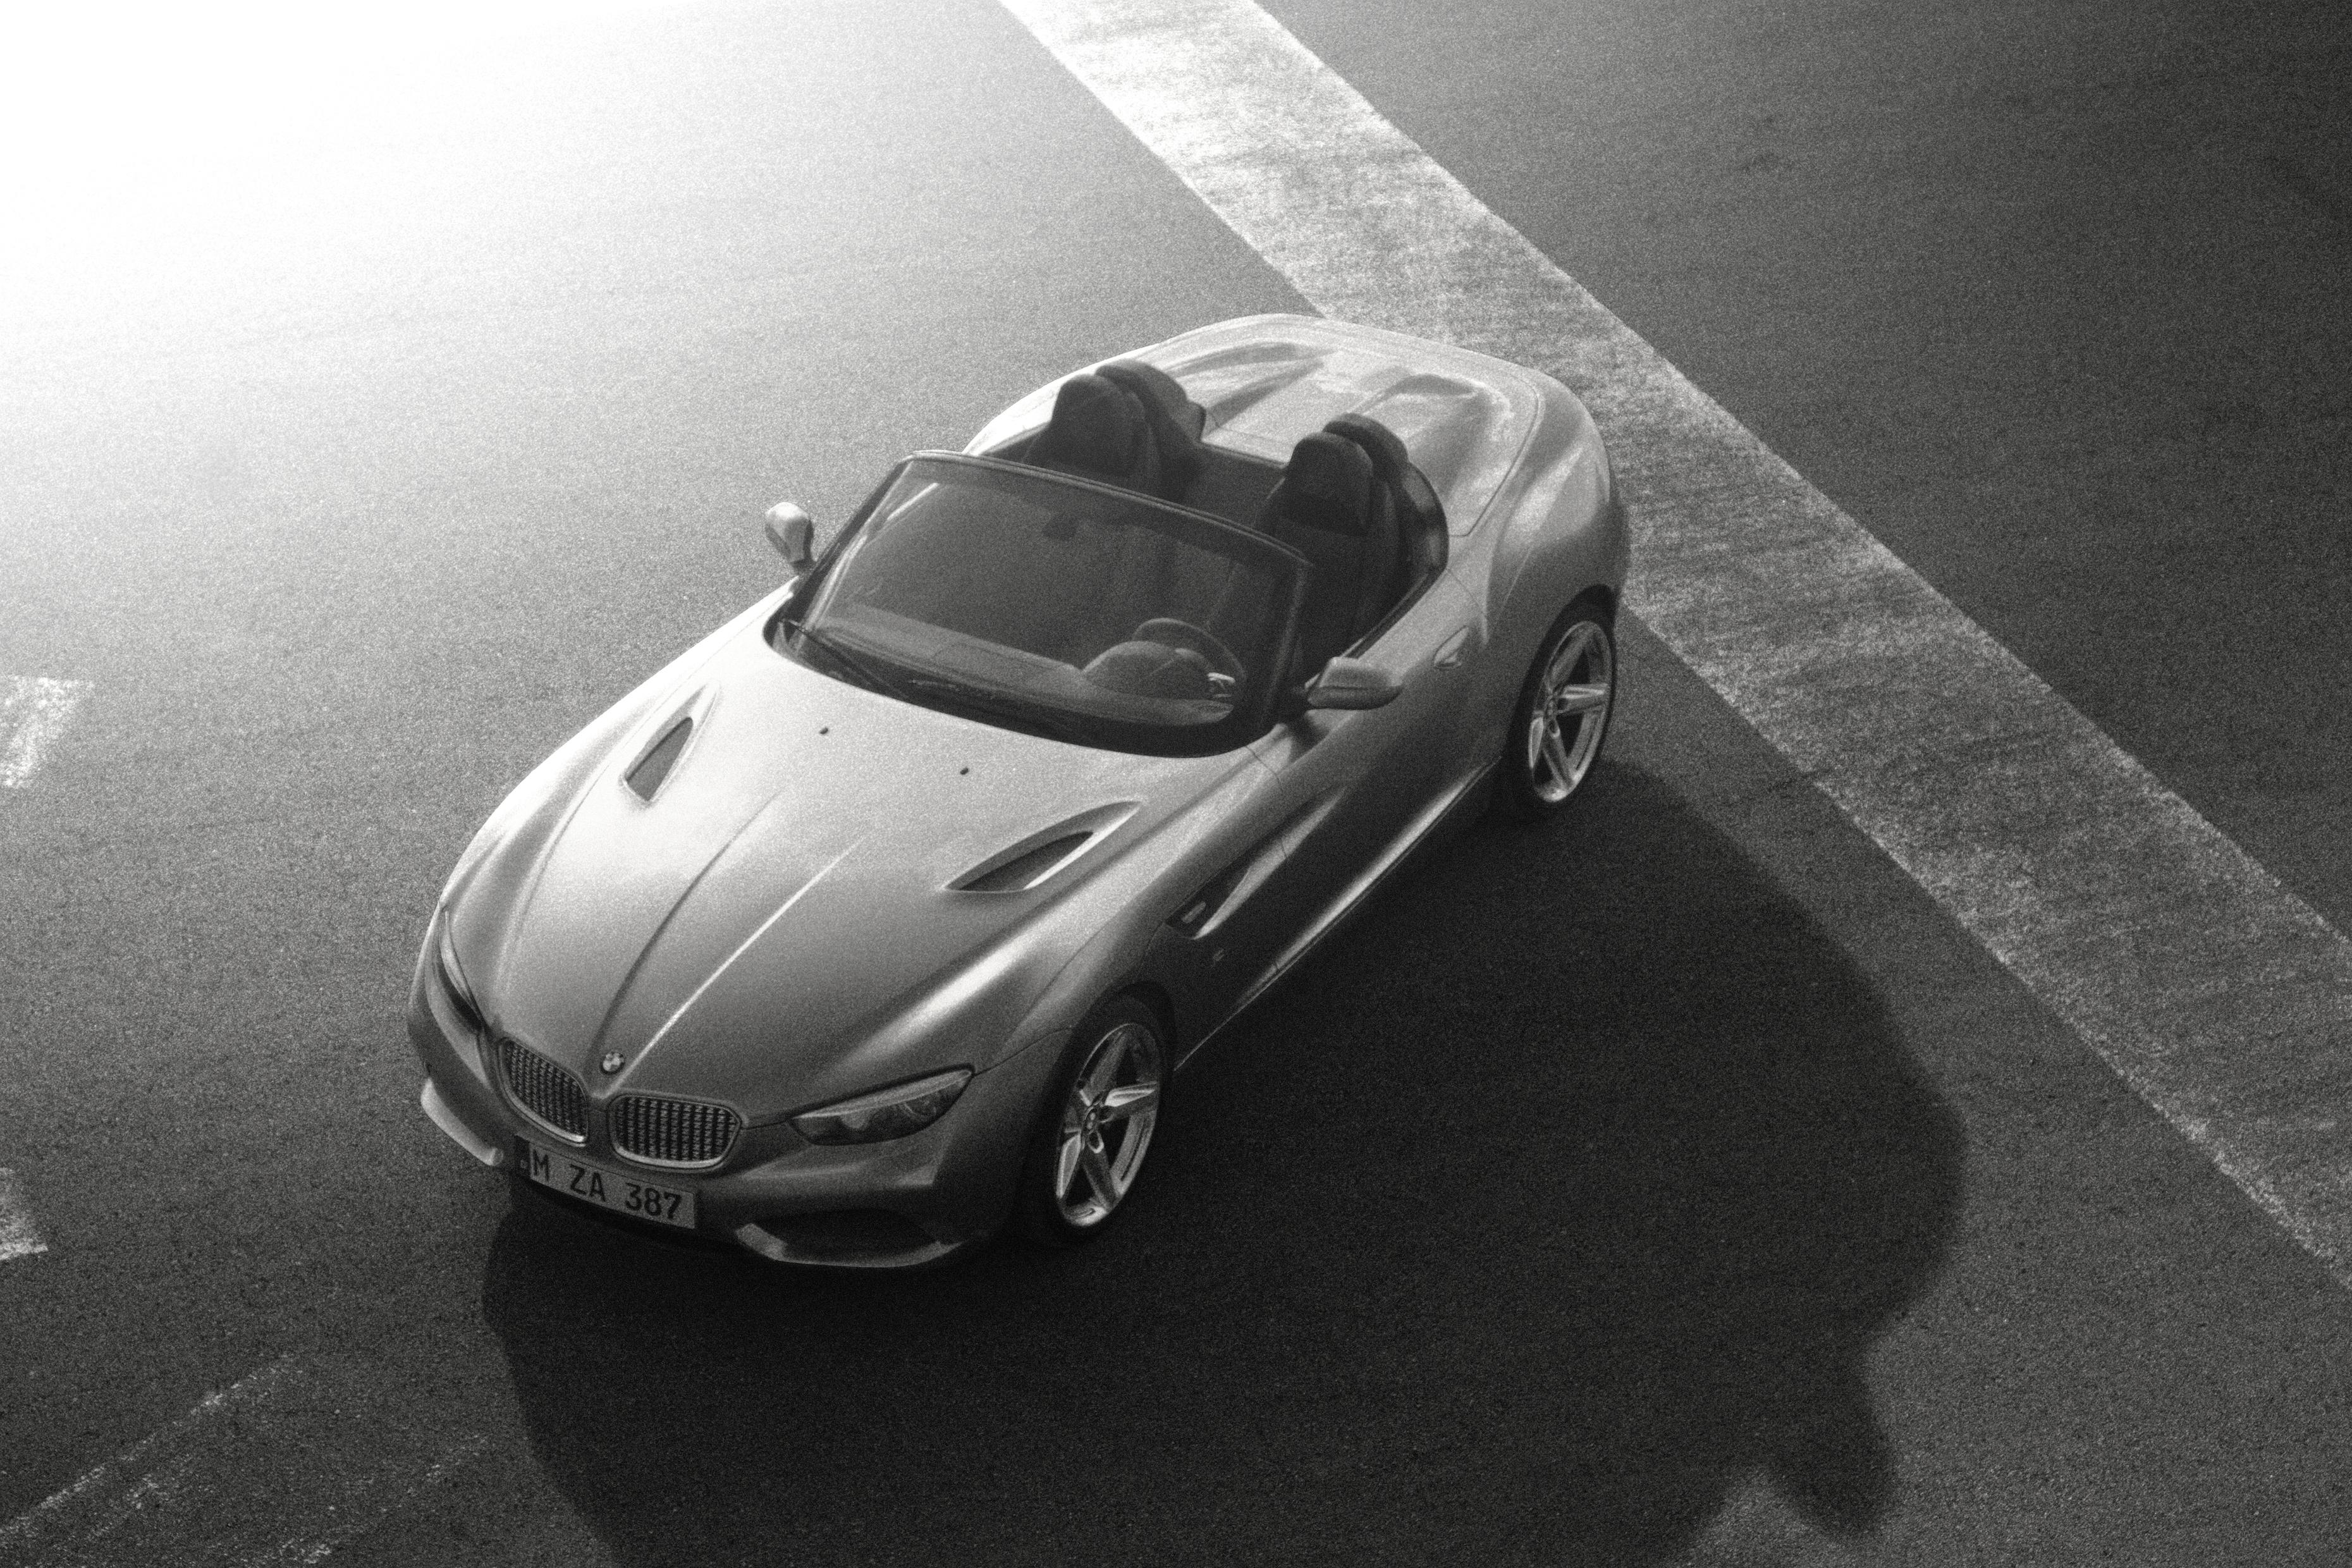 Bmw Zagato Roadster Debuts At Pebble Beach 2012 Paul Tan